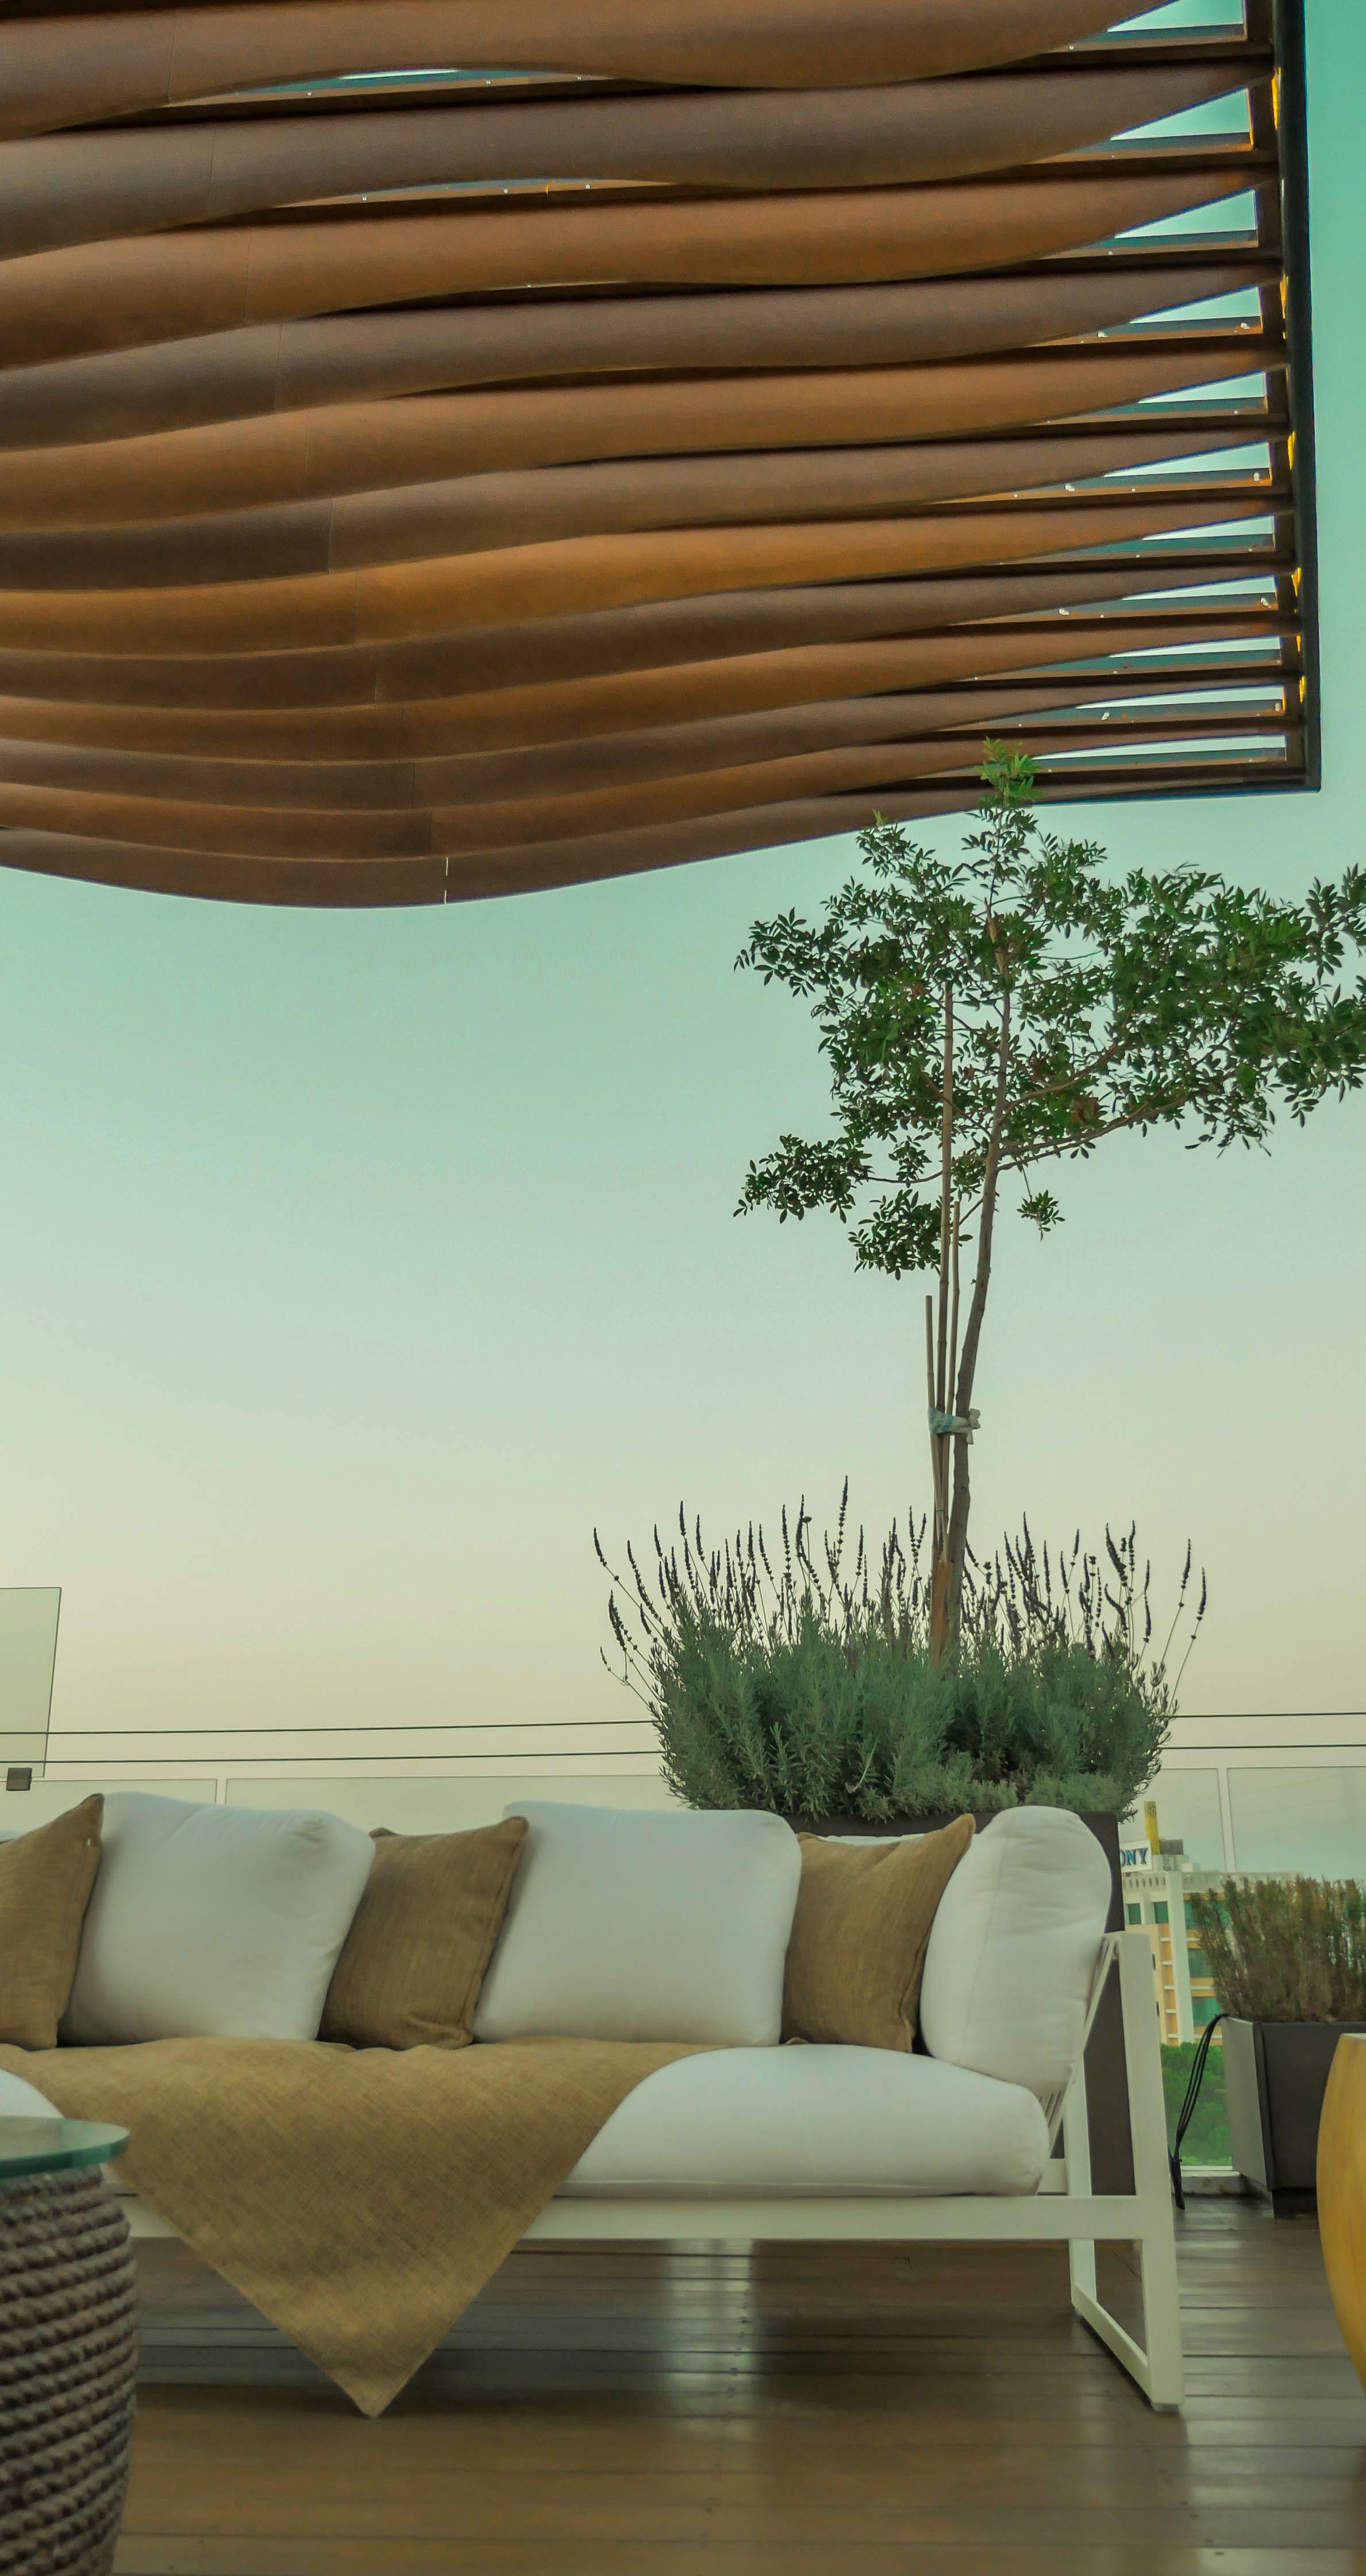 Minimal Pergola By Ekky Studio Architects Nicosia Cyprus Roof Garden Design Outdoor Design Outdoor Decor